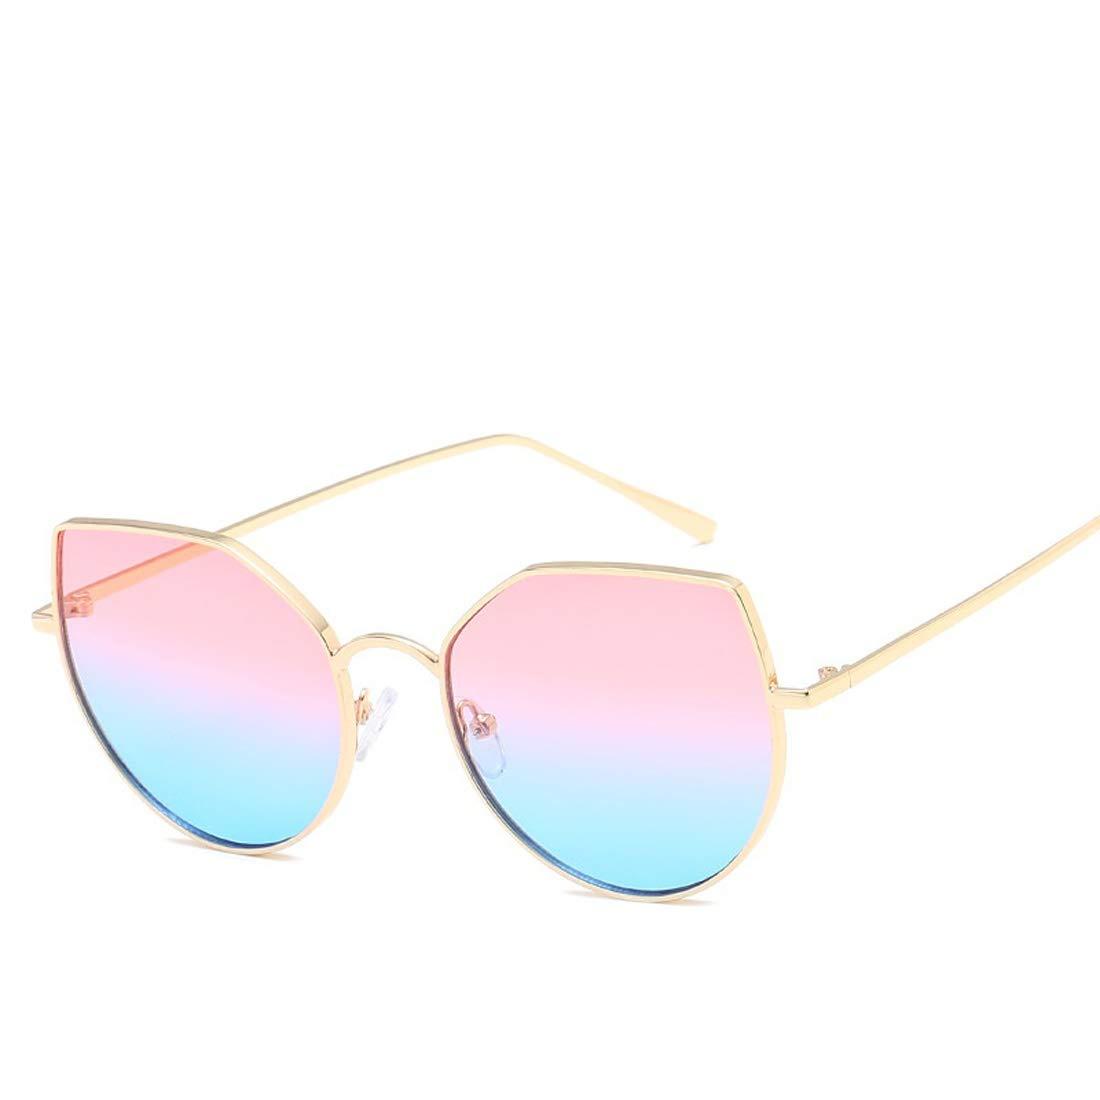 Wsunglass New metal Cat Eye Sunglasses Fashion colorful ocean Sunglasses men and women general trend Sunglasse/_1